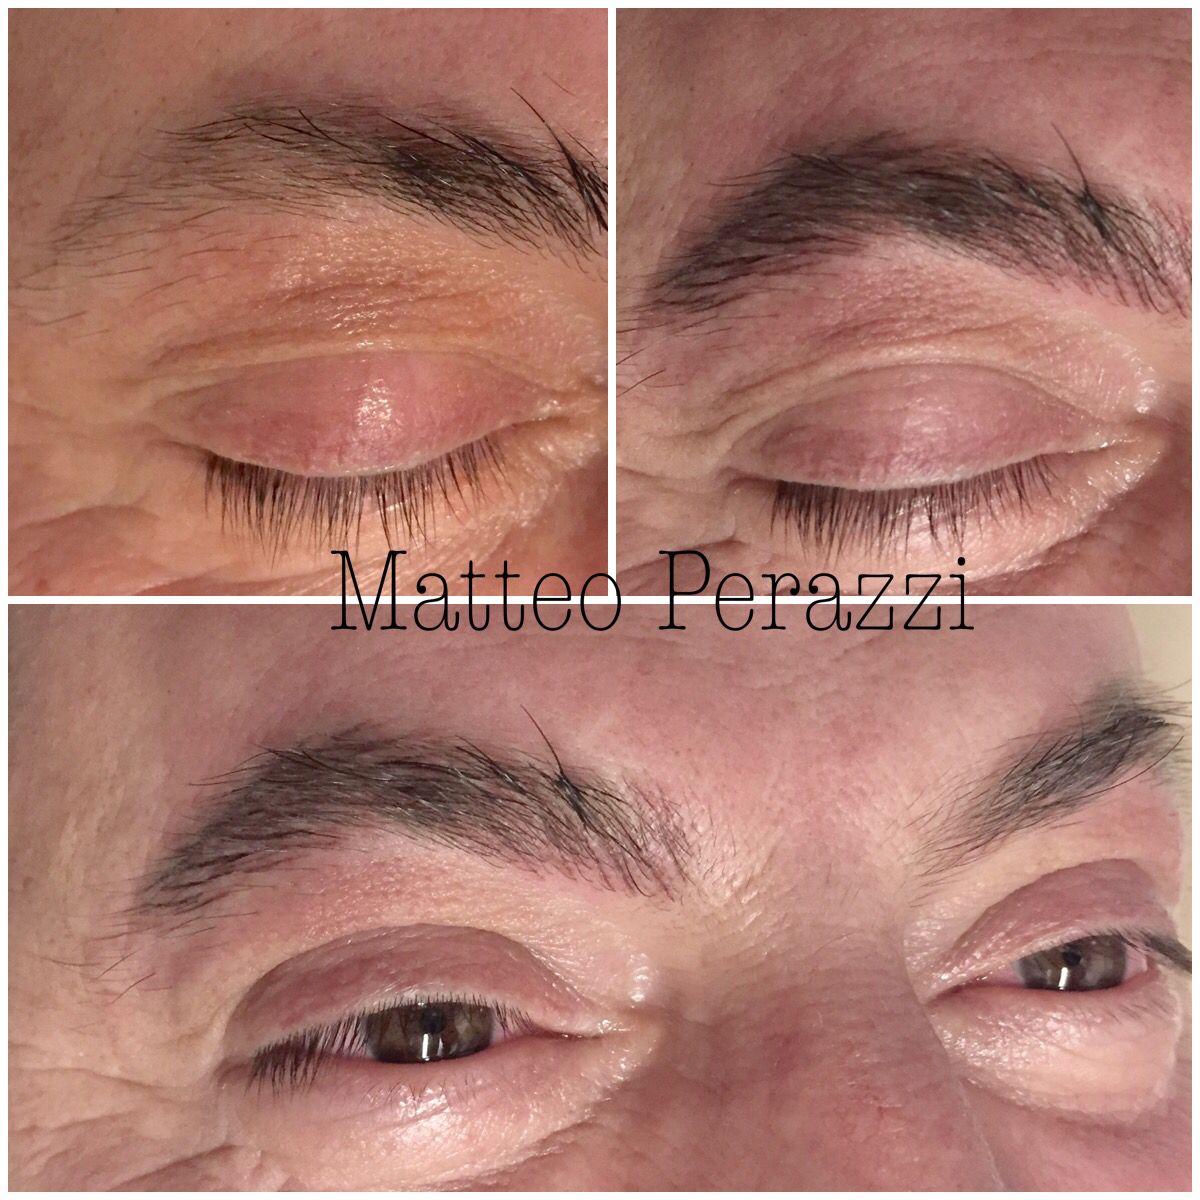 Pmu Male Eyebrows Microblanding Pinterest Eyebrows Brows And